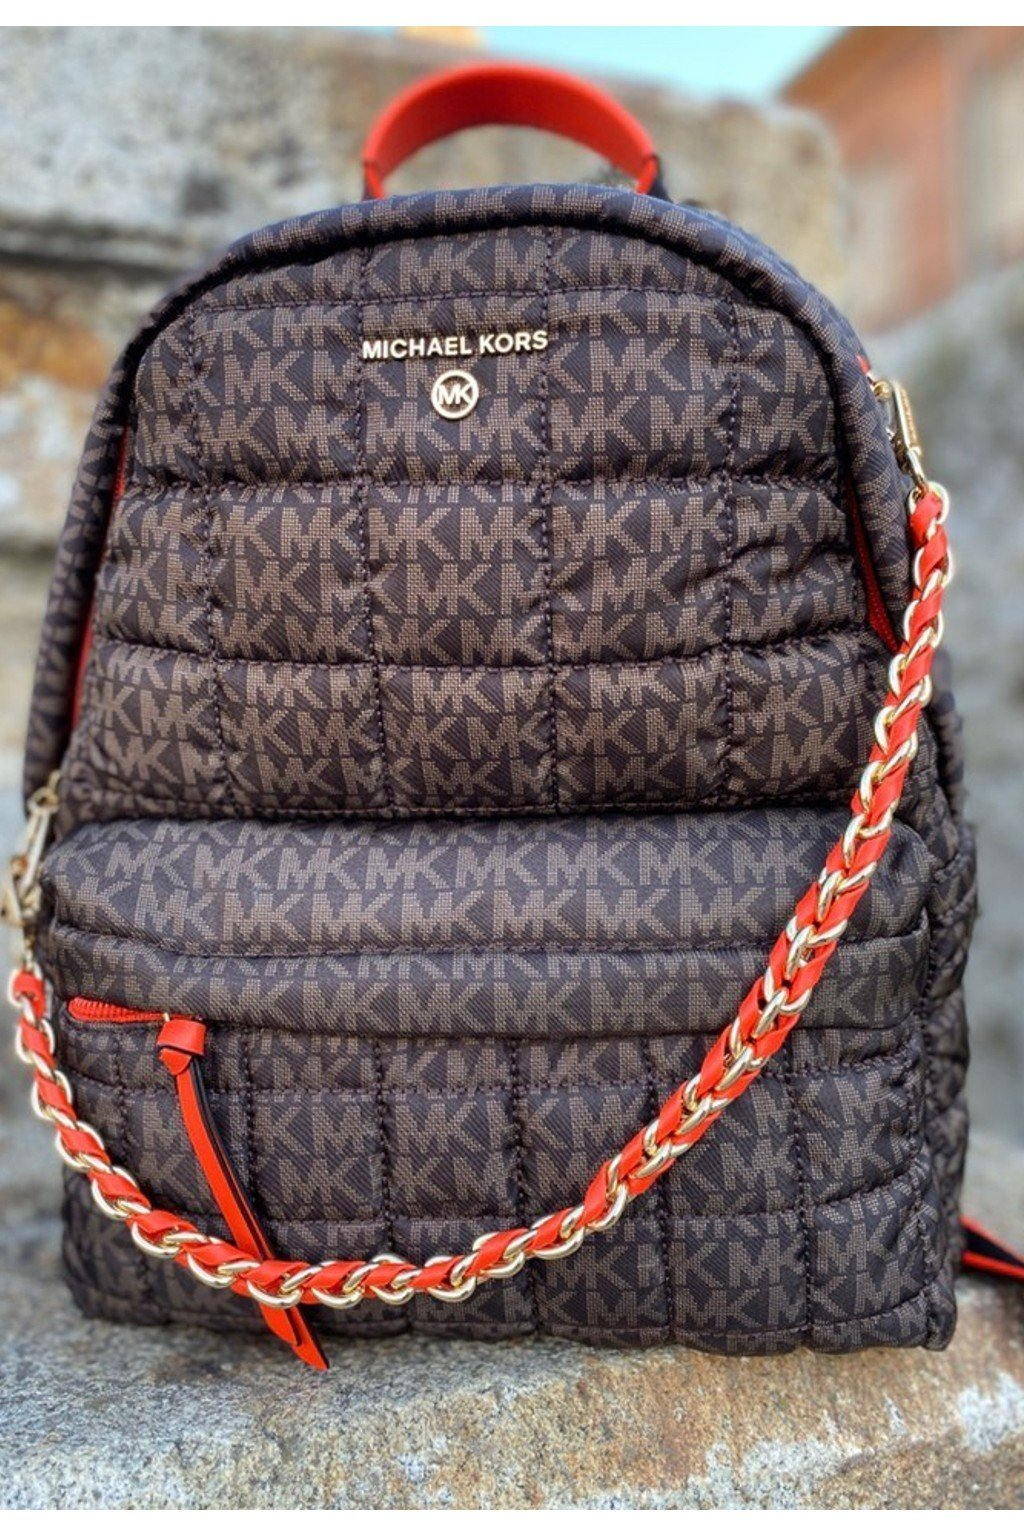 Dámský batoh Michael Kors 30F1G04B2U hnědý